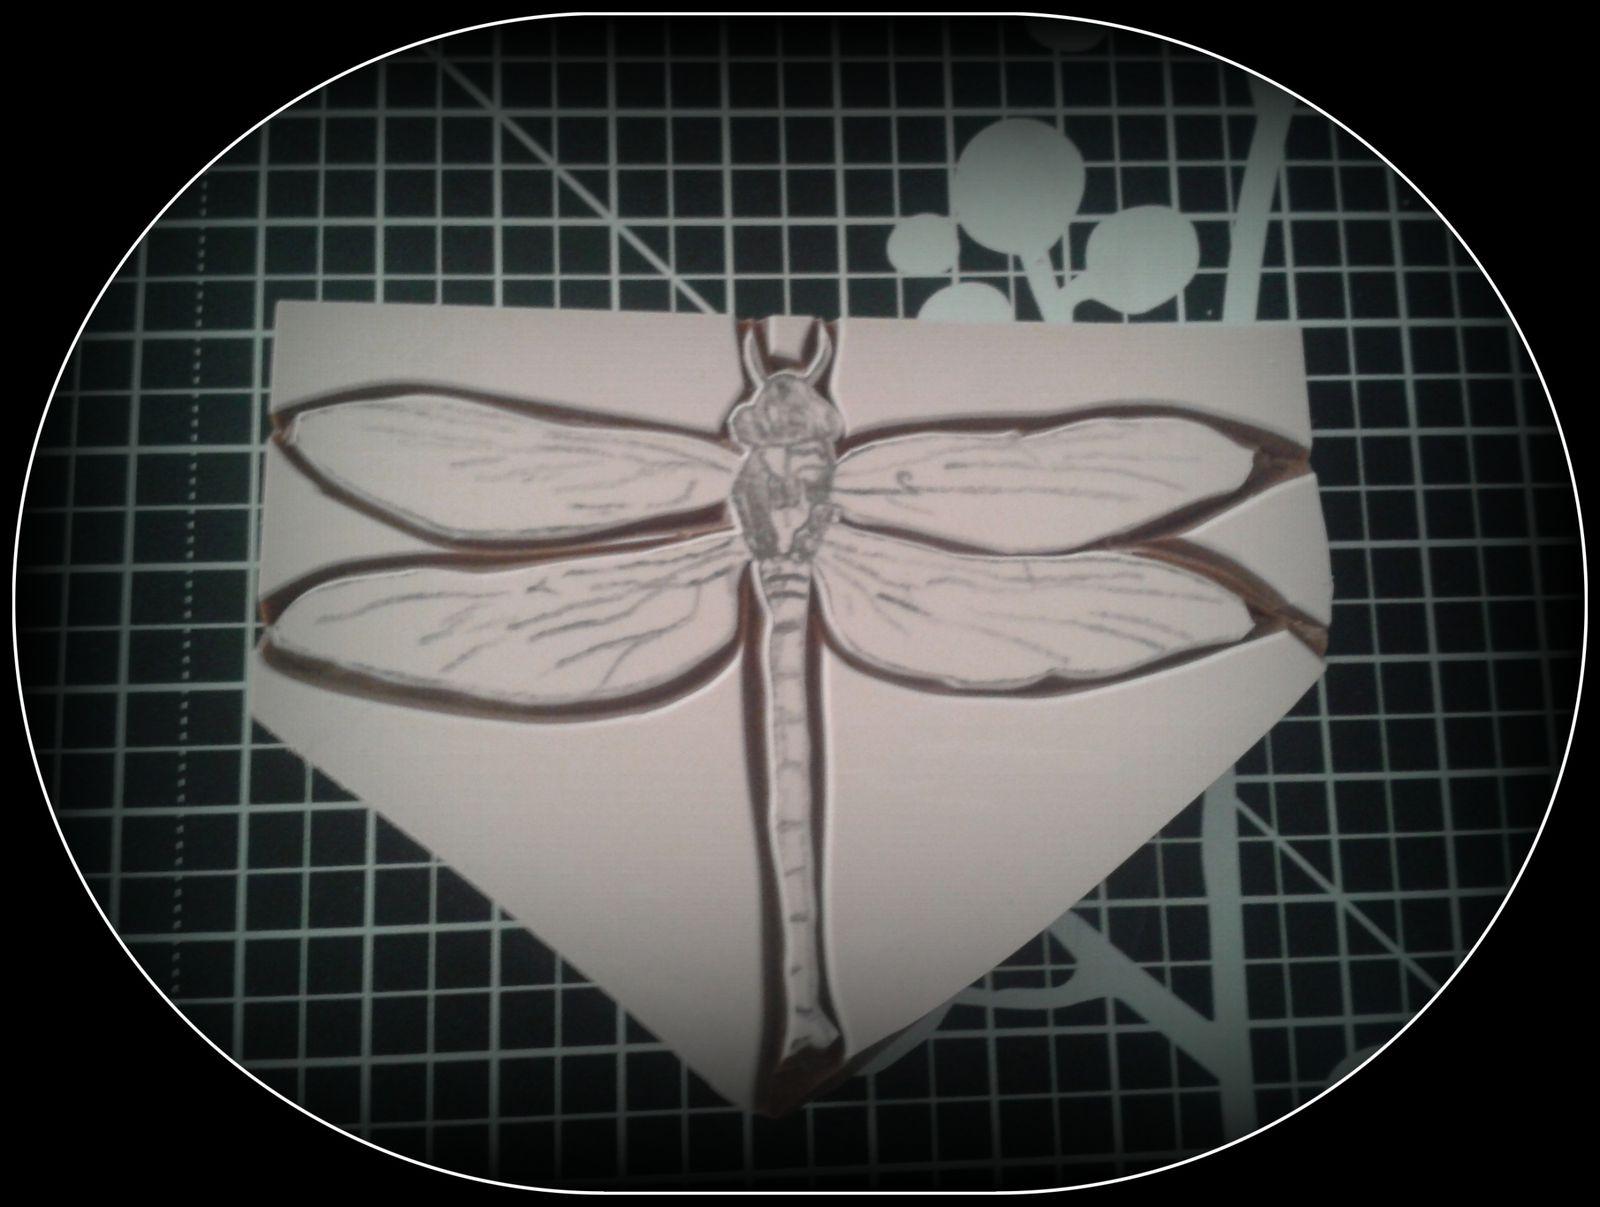 découpe autour du dessin... Cut all around the dragonfly...